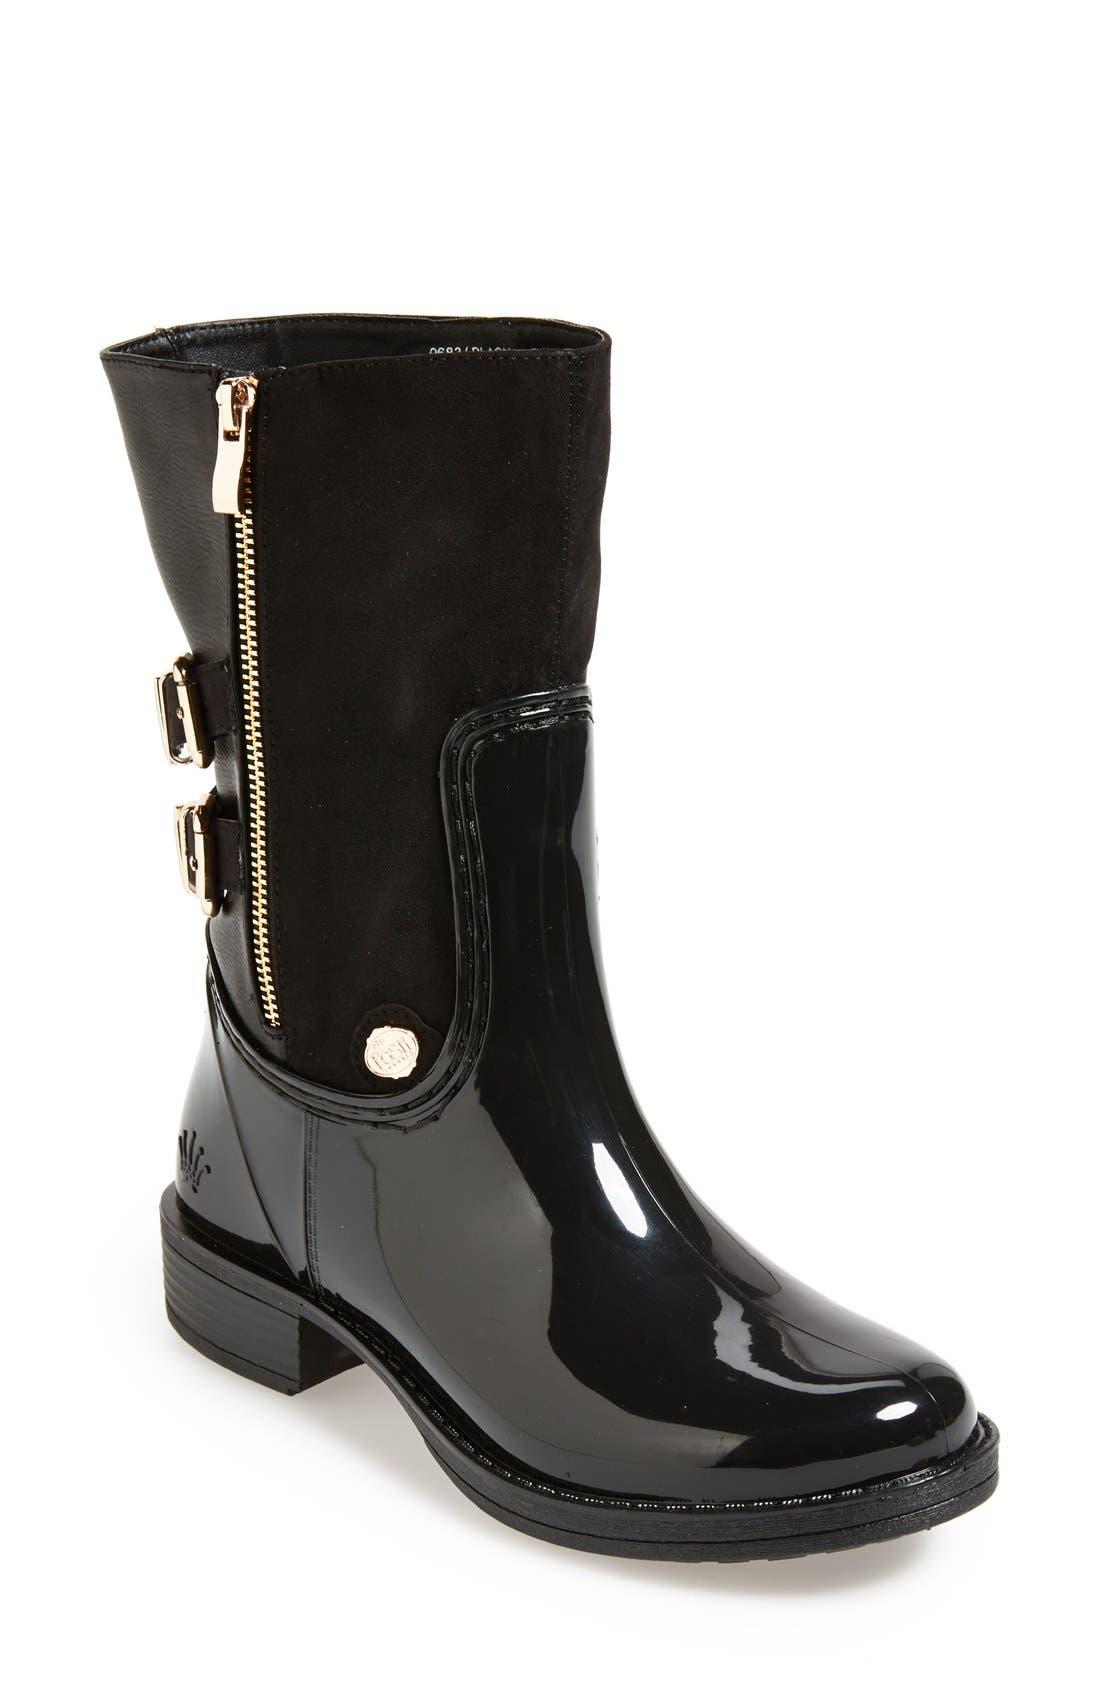 Main Image - Posh Wellies 'Resilience' Mid Rain Boot (Women)